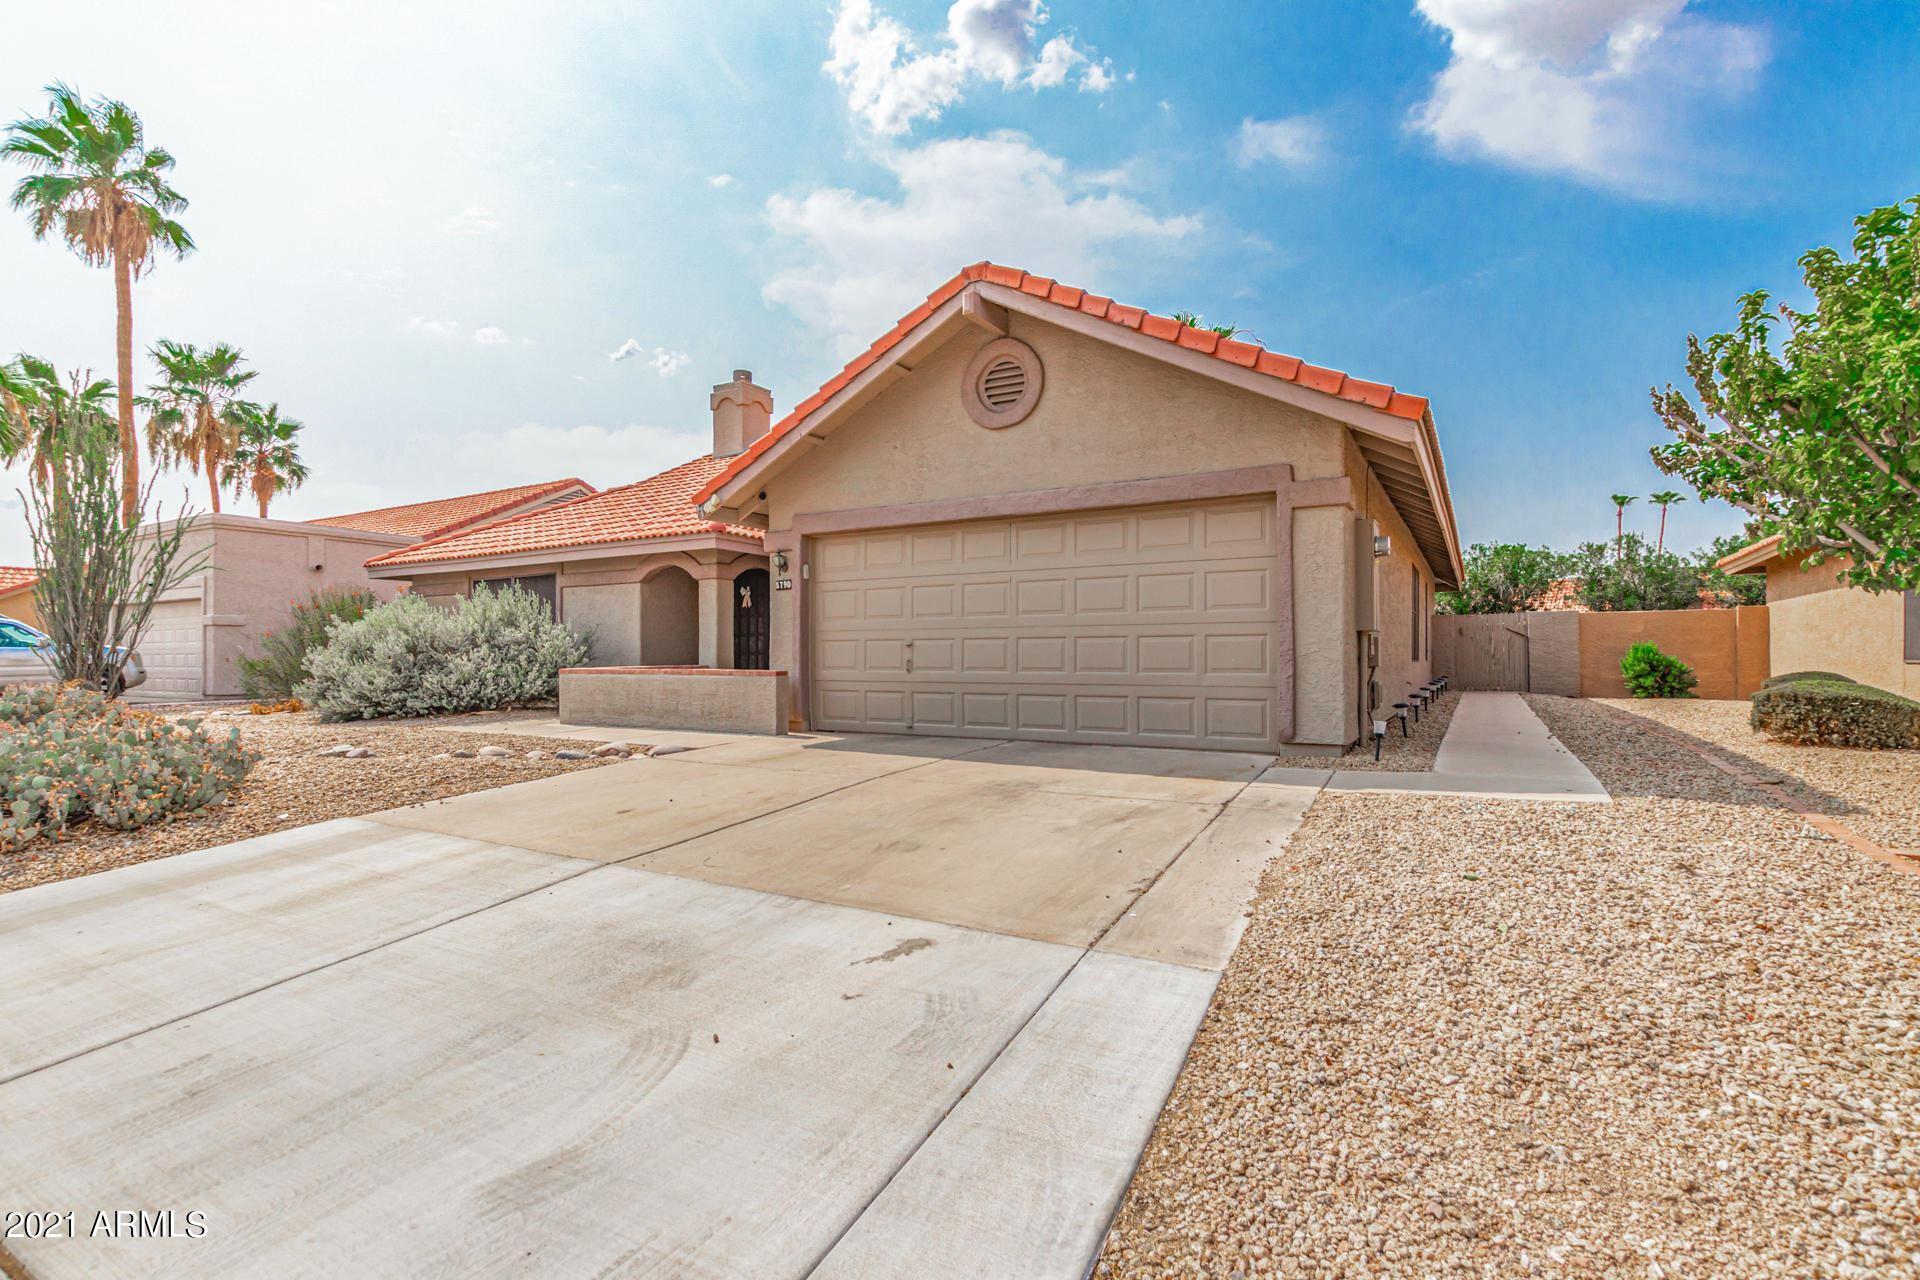 Photo of 5790 W KESLER Street, Chandler, AZ 85226 (MLS # 6269132)